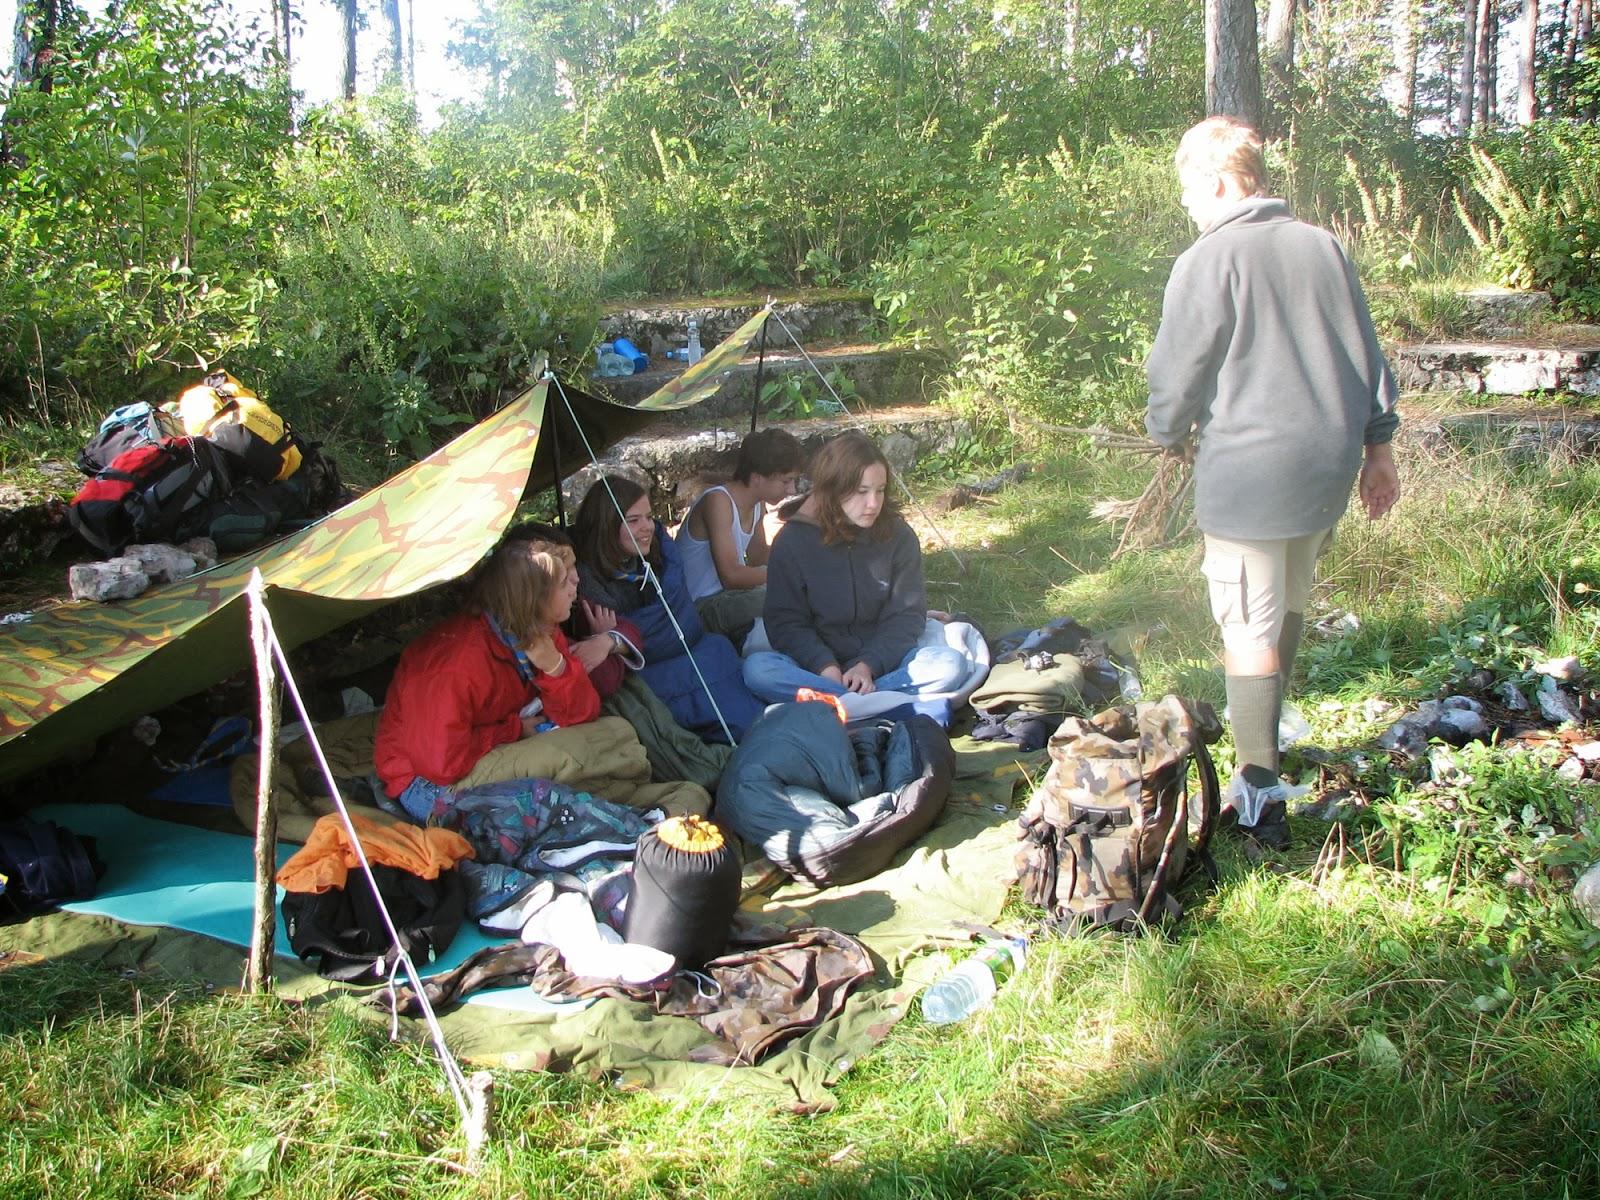 Prehod PP, Ilirska Bistrica 2005 - picture%2B101.jpg